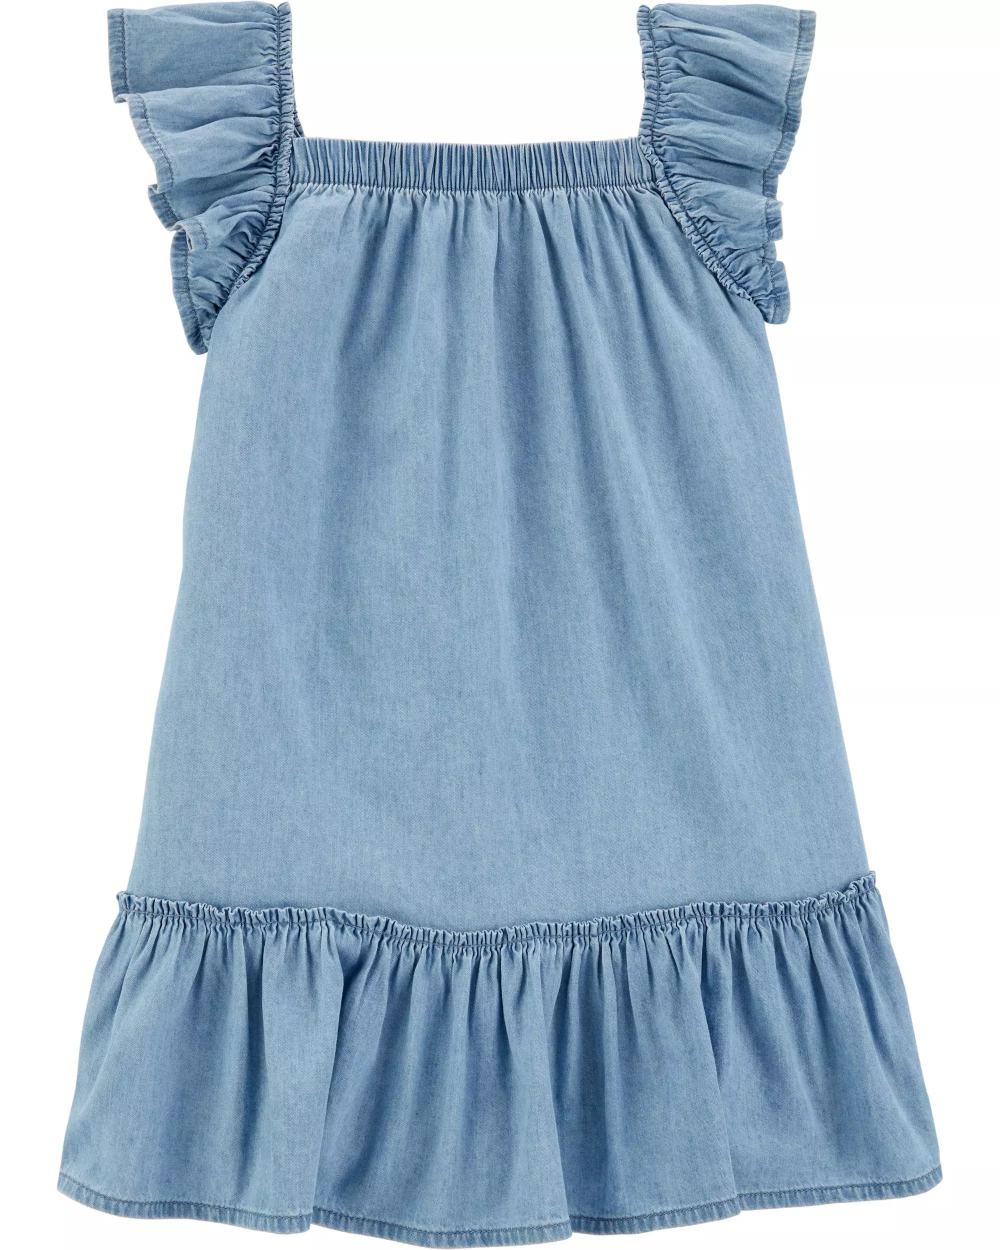 Ruffle Denim Dress Denim Ruffle Dress Denim Dress Baby Girl Dresses [ 1250 x 1000 Pixel ]